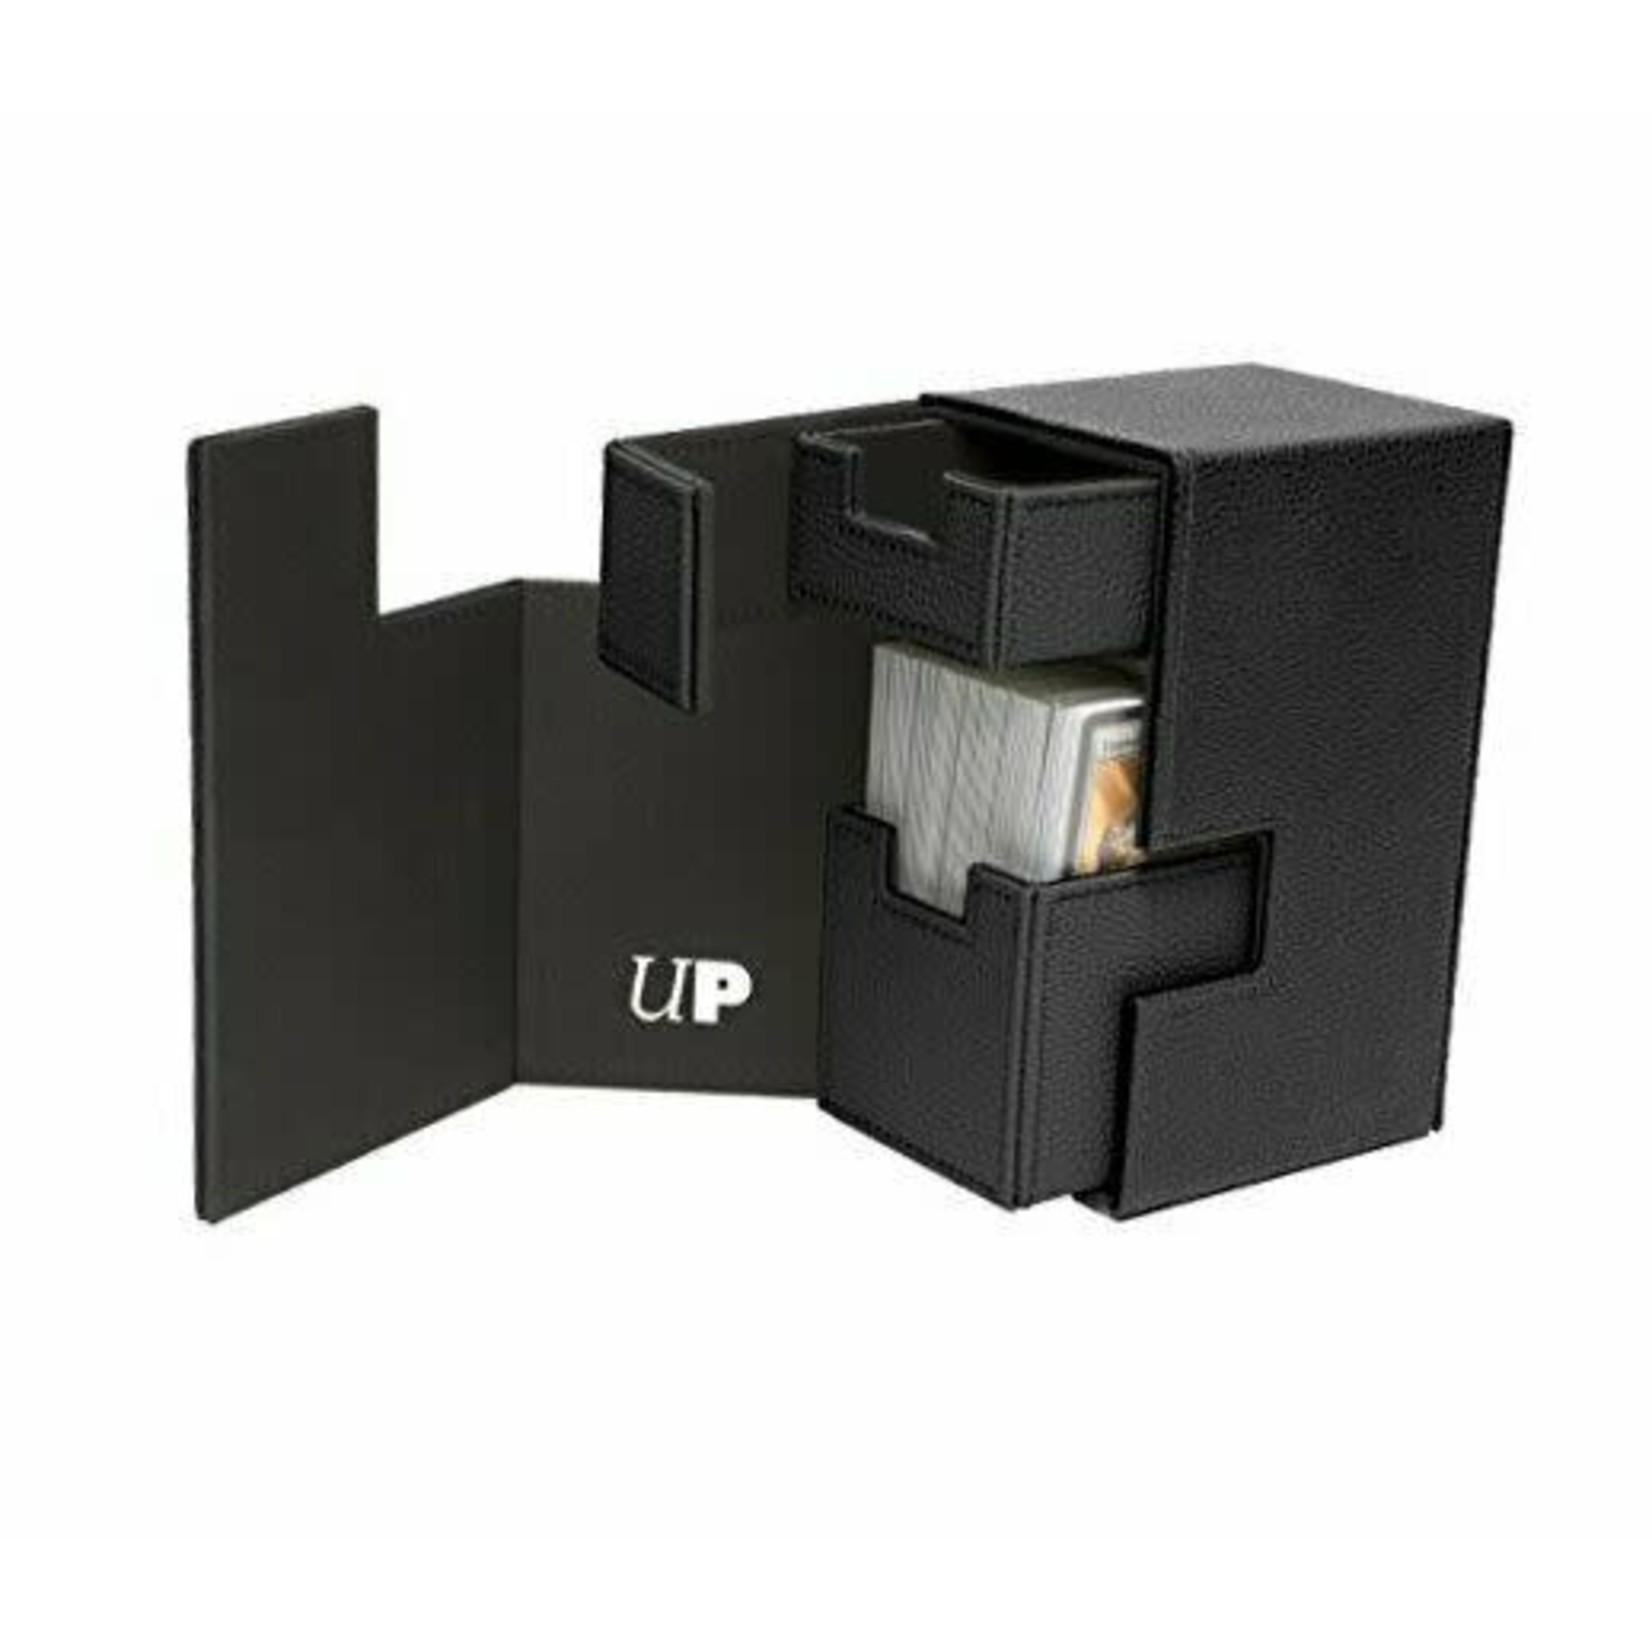 M2 Deck Box Black/Black